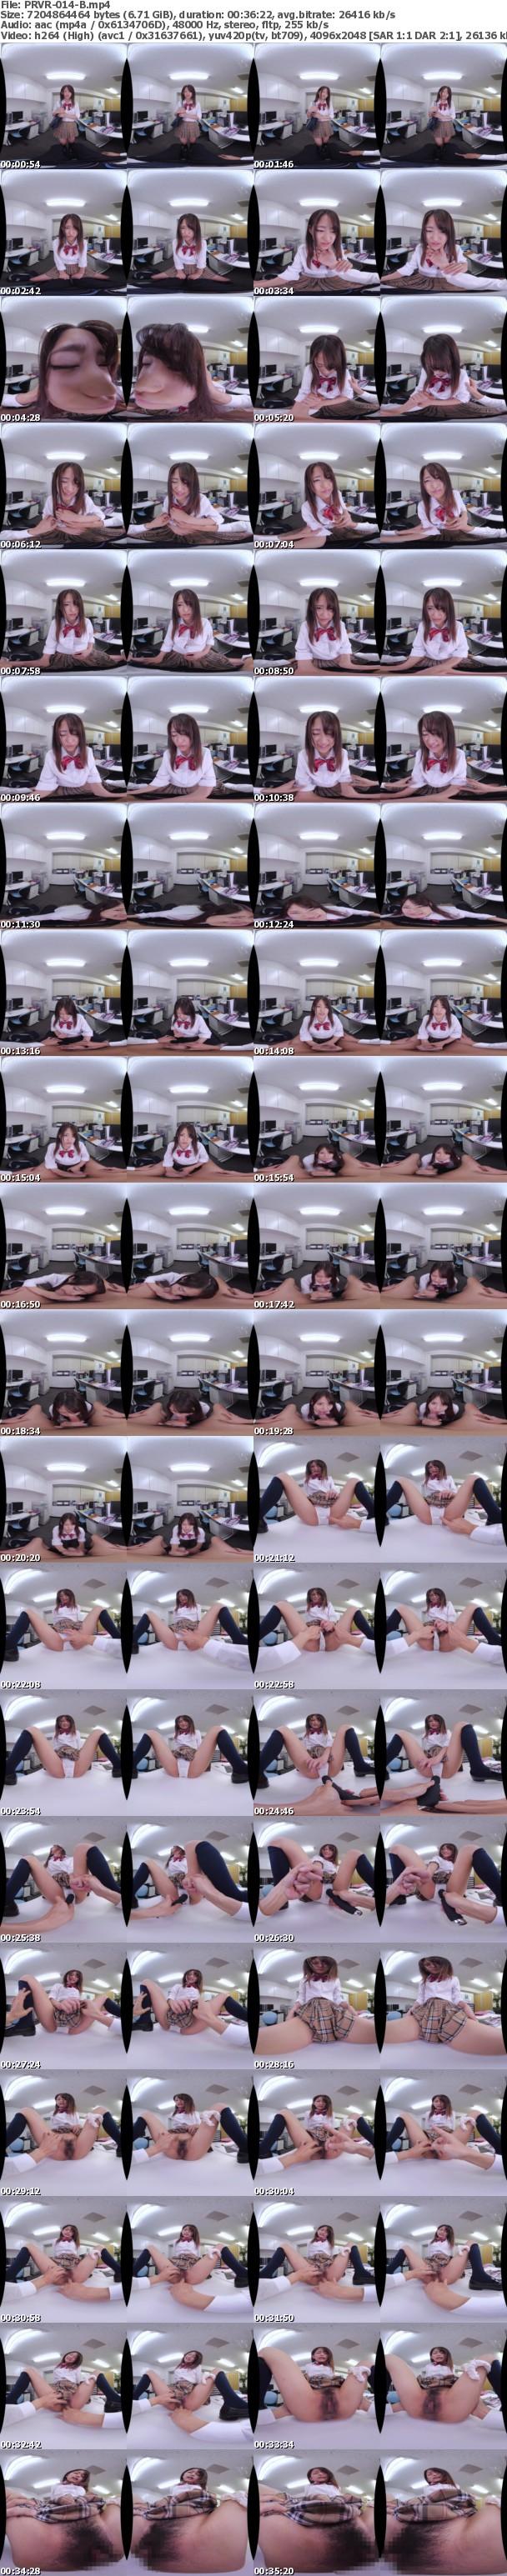 (VR) PRVR-014 【HQ高画質】渚みつきはアナタの生徒!大人気ピンサロ店で働くのを見つけて卑怯な性教育開始! 口内ザーメンぶちまけた後日、職員室に呼び出して感度最高のキツマンを何度もイカせて特濃中出し!